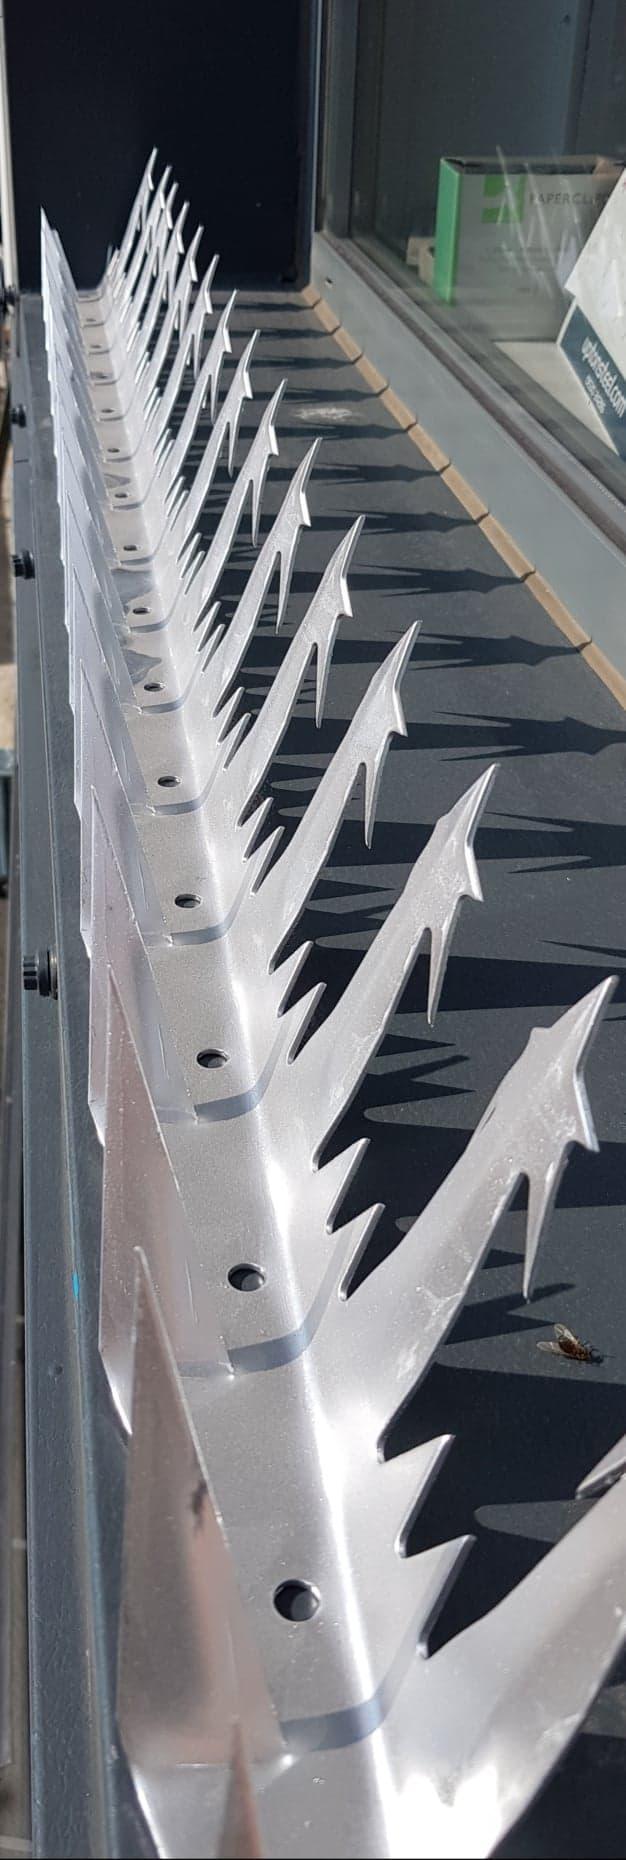 Heavy Duty Concertina Razor Wire Galvanised Razor Wire